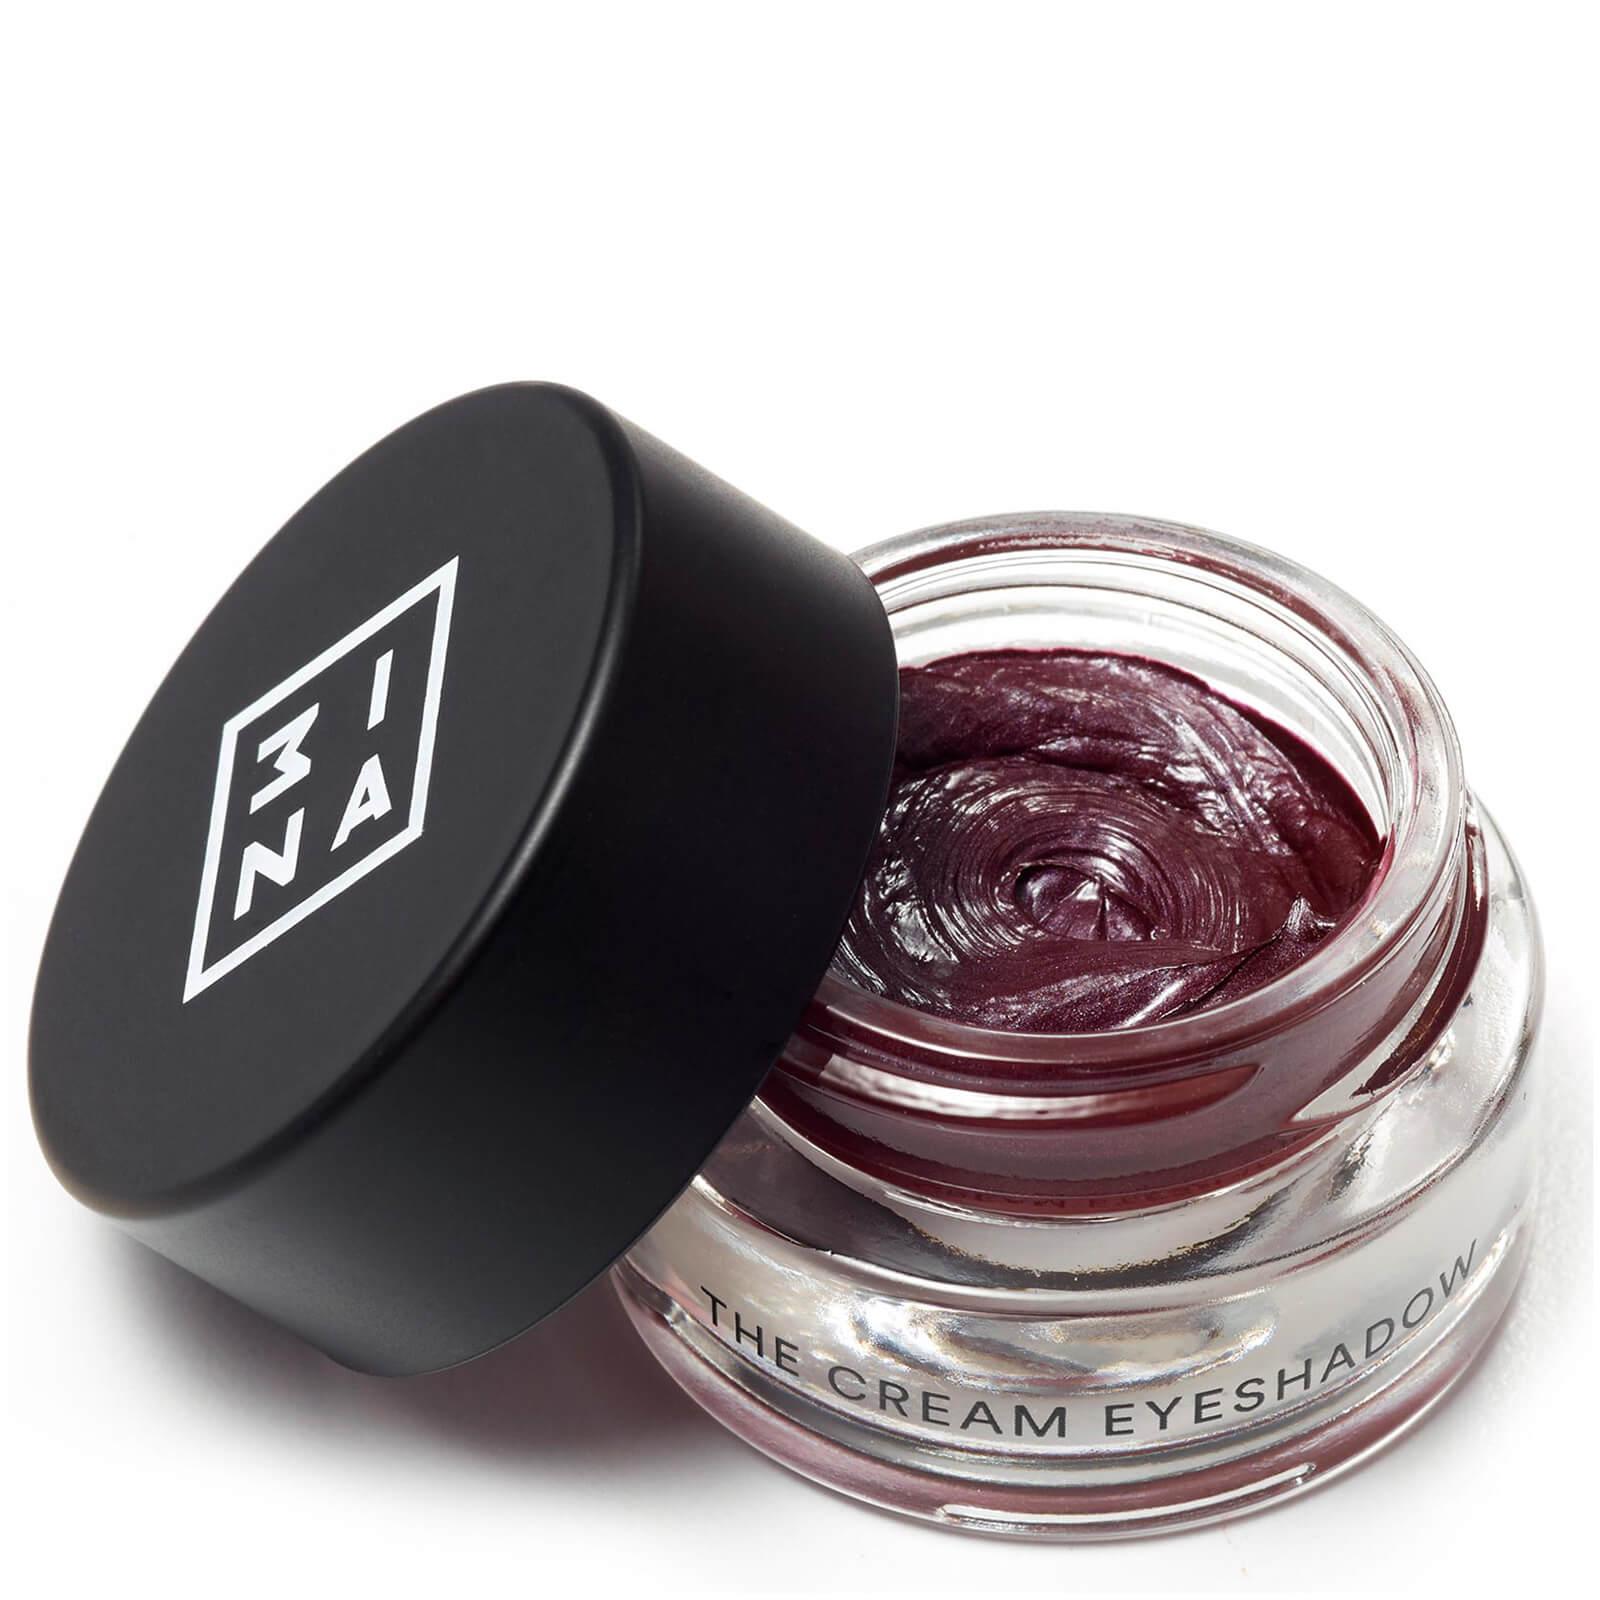 3INA Makeup The Cream Eyeshadow 3ml (Various Shades) - 318 Plum